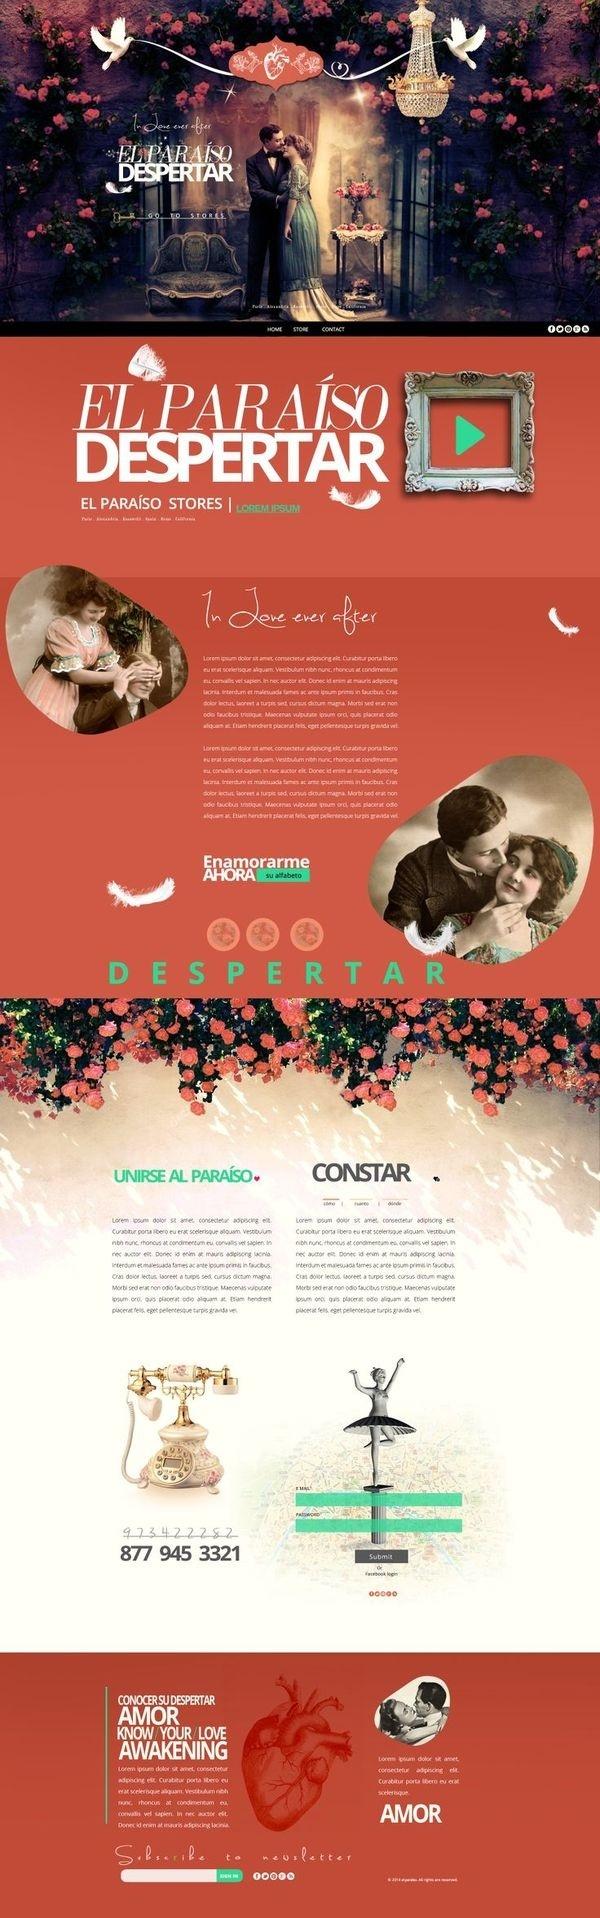 layout #design #graphic #vintage #layout #love